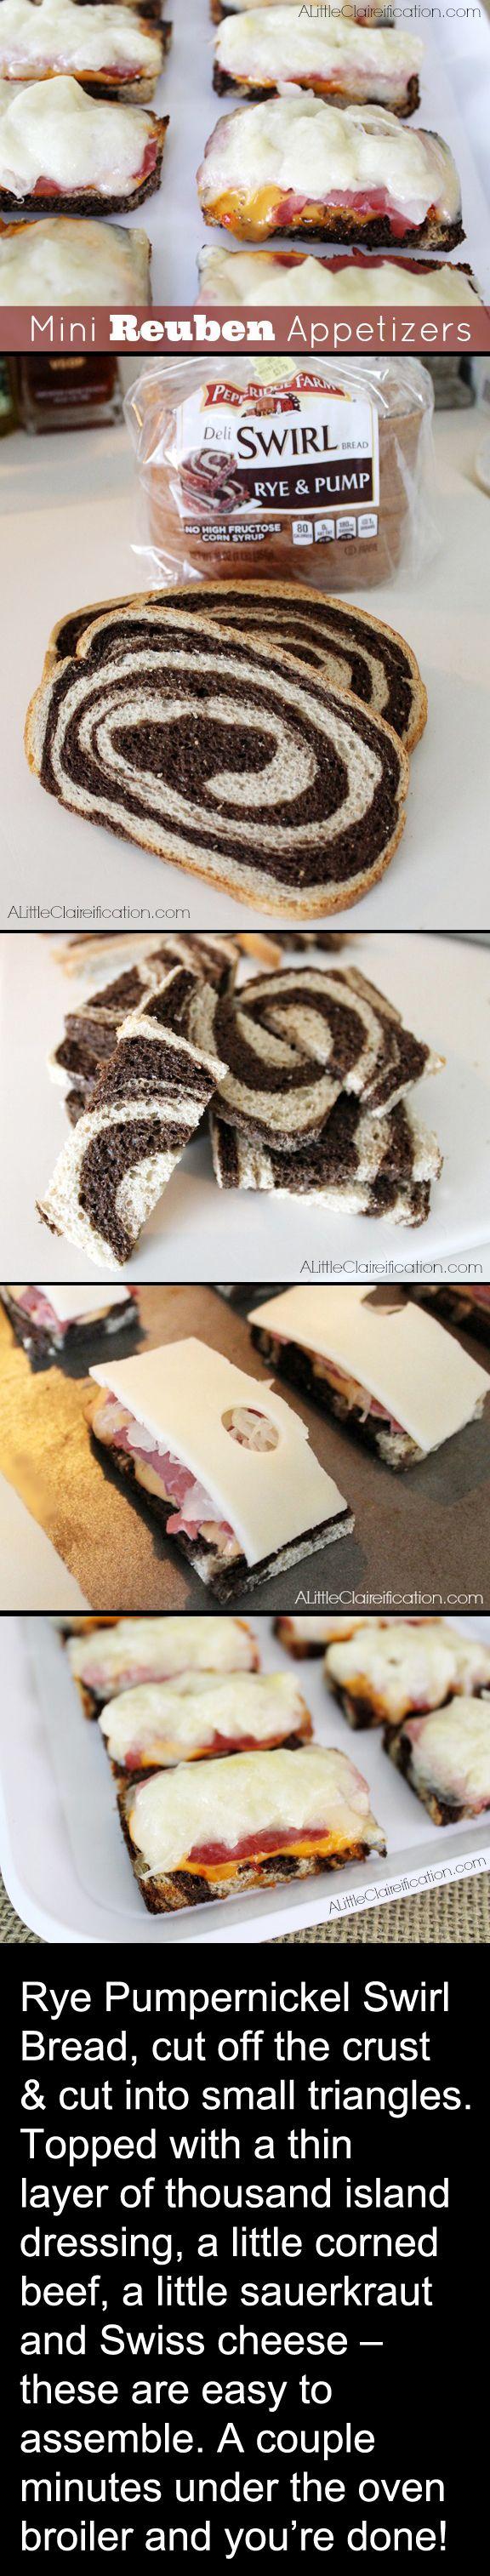 Bunco Party Food Menu Ideas Recipes